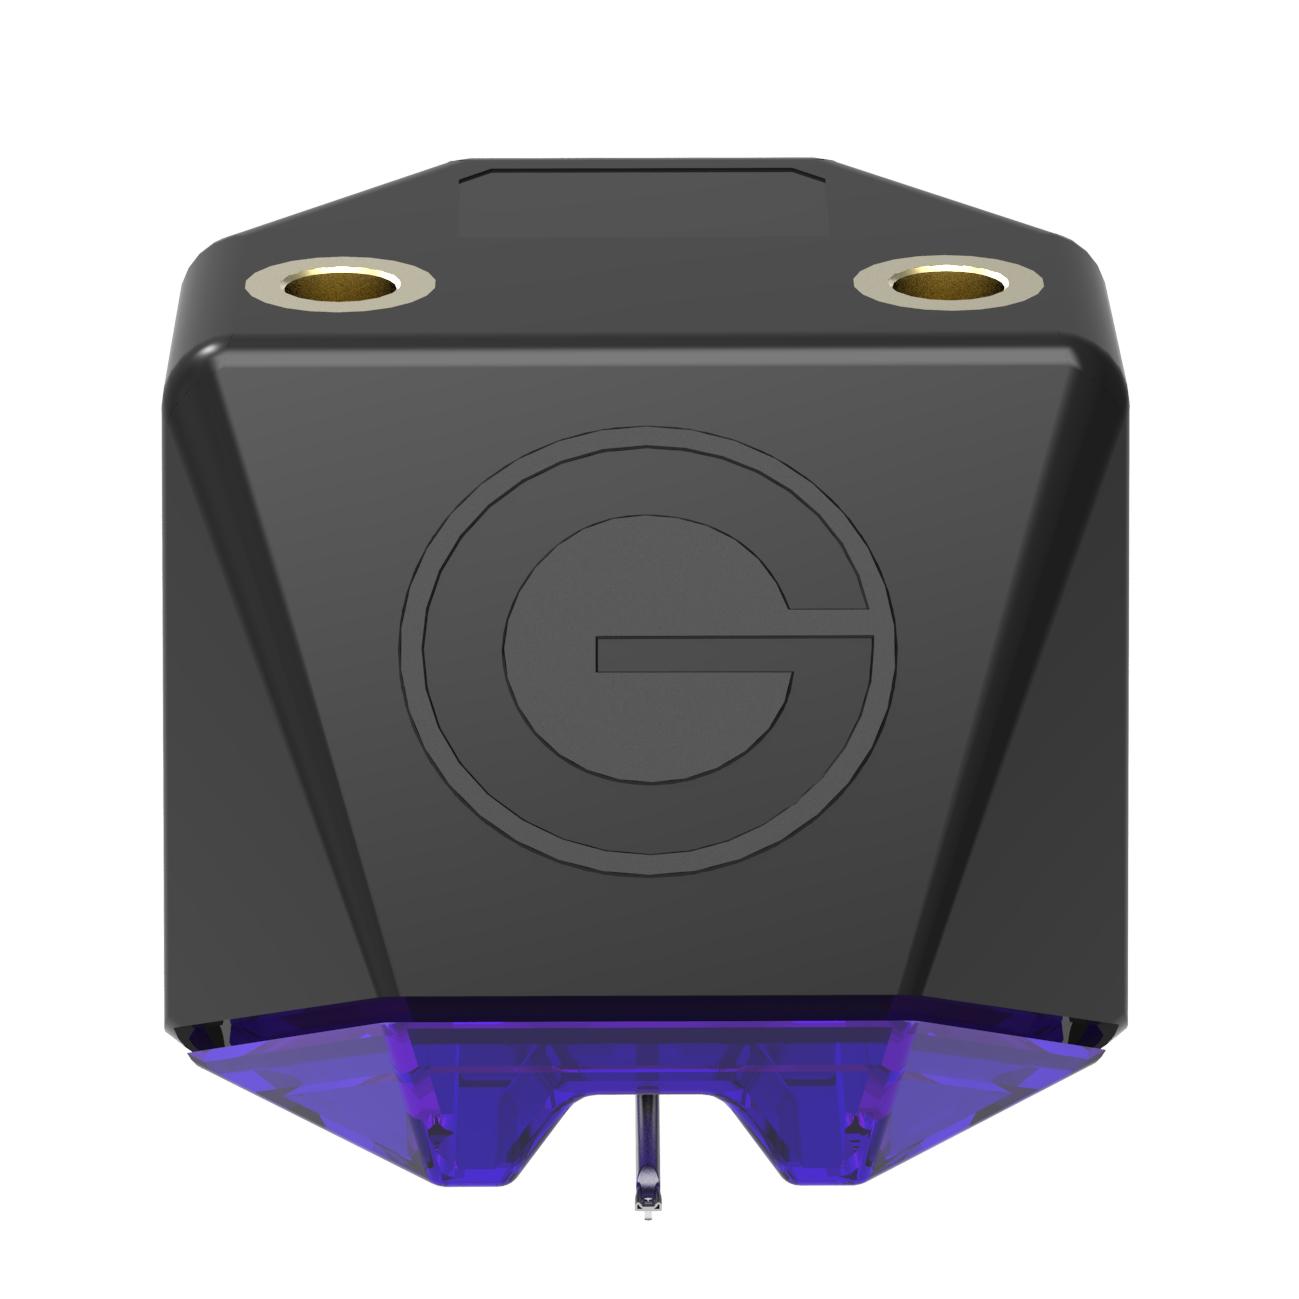 E3-cartridge-front-angle_222855_2.jpg